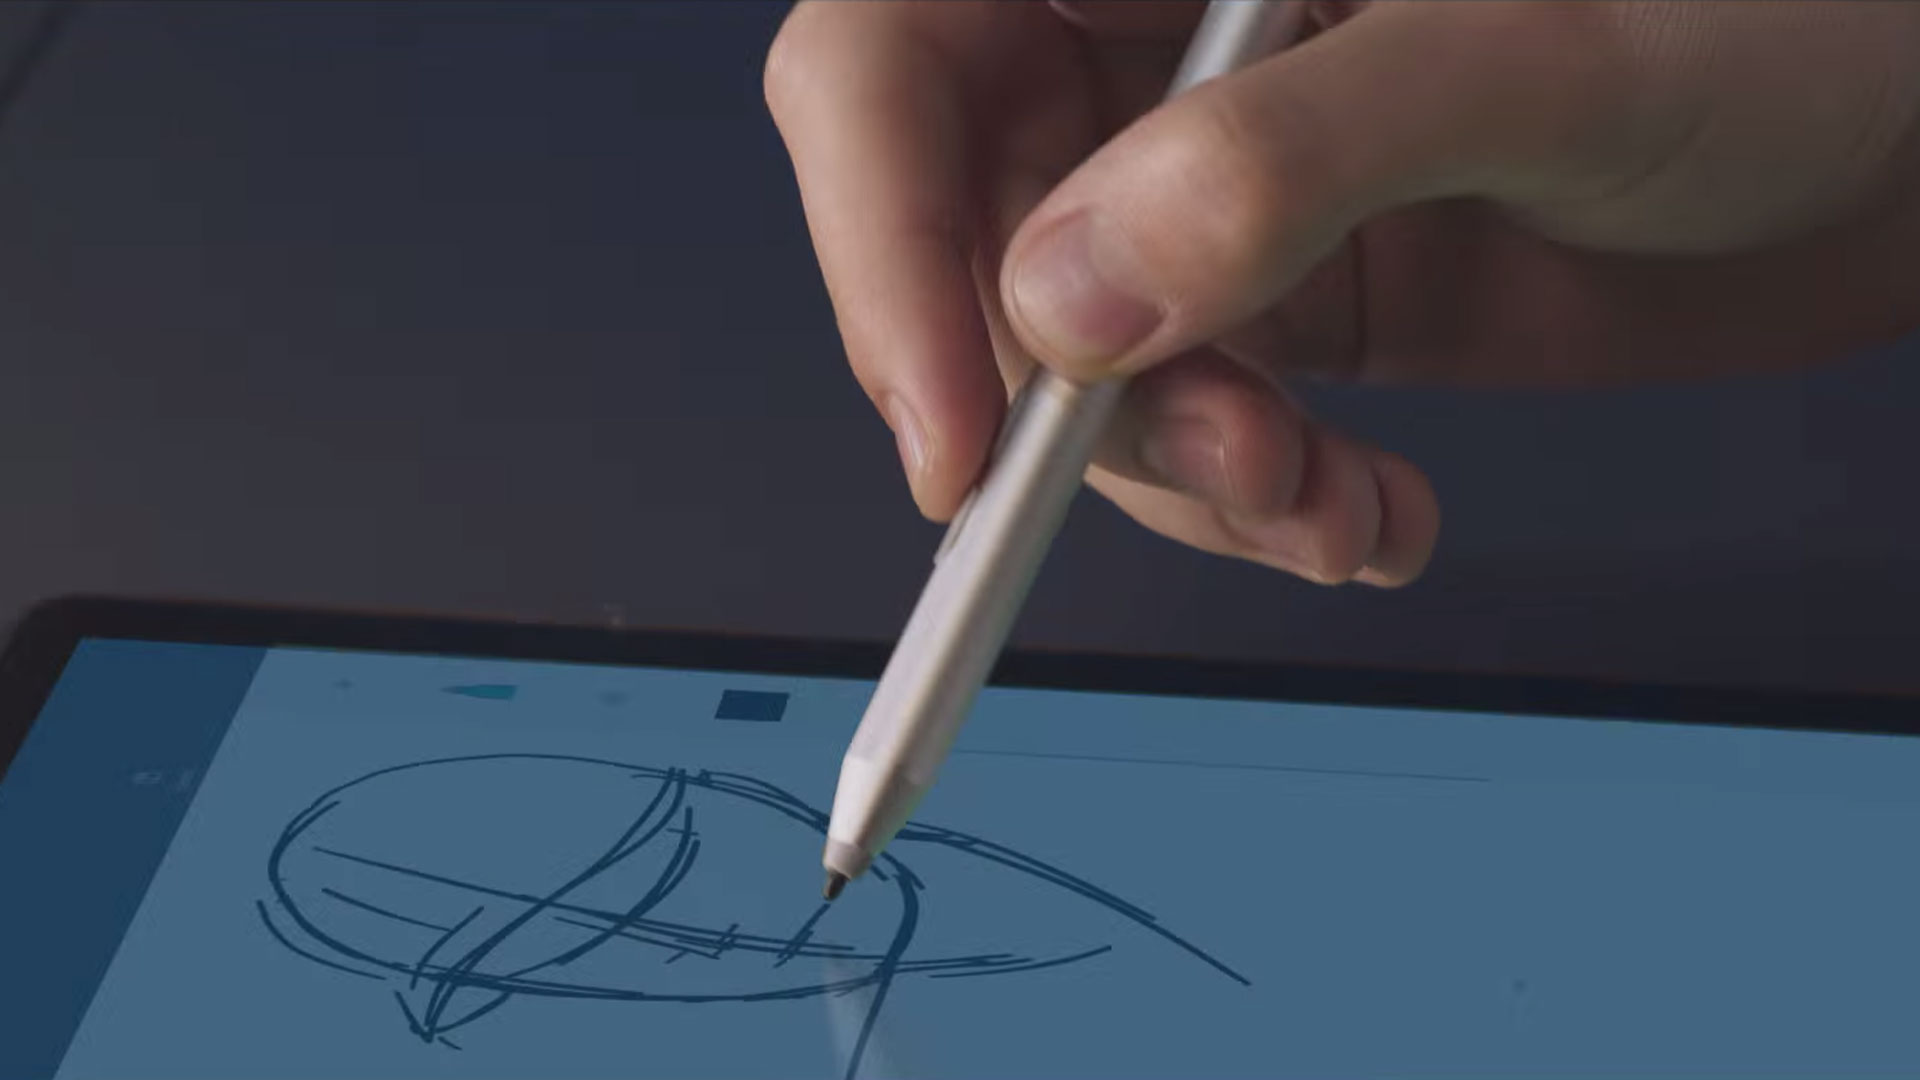 ZenBook Flip S stylus input